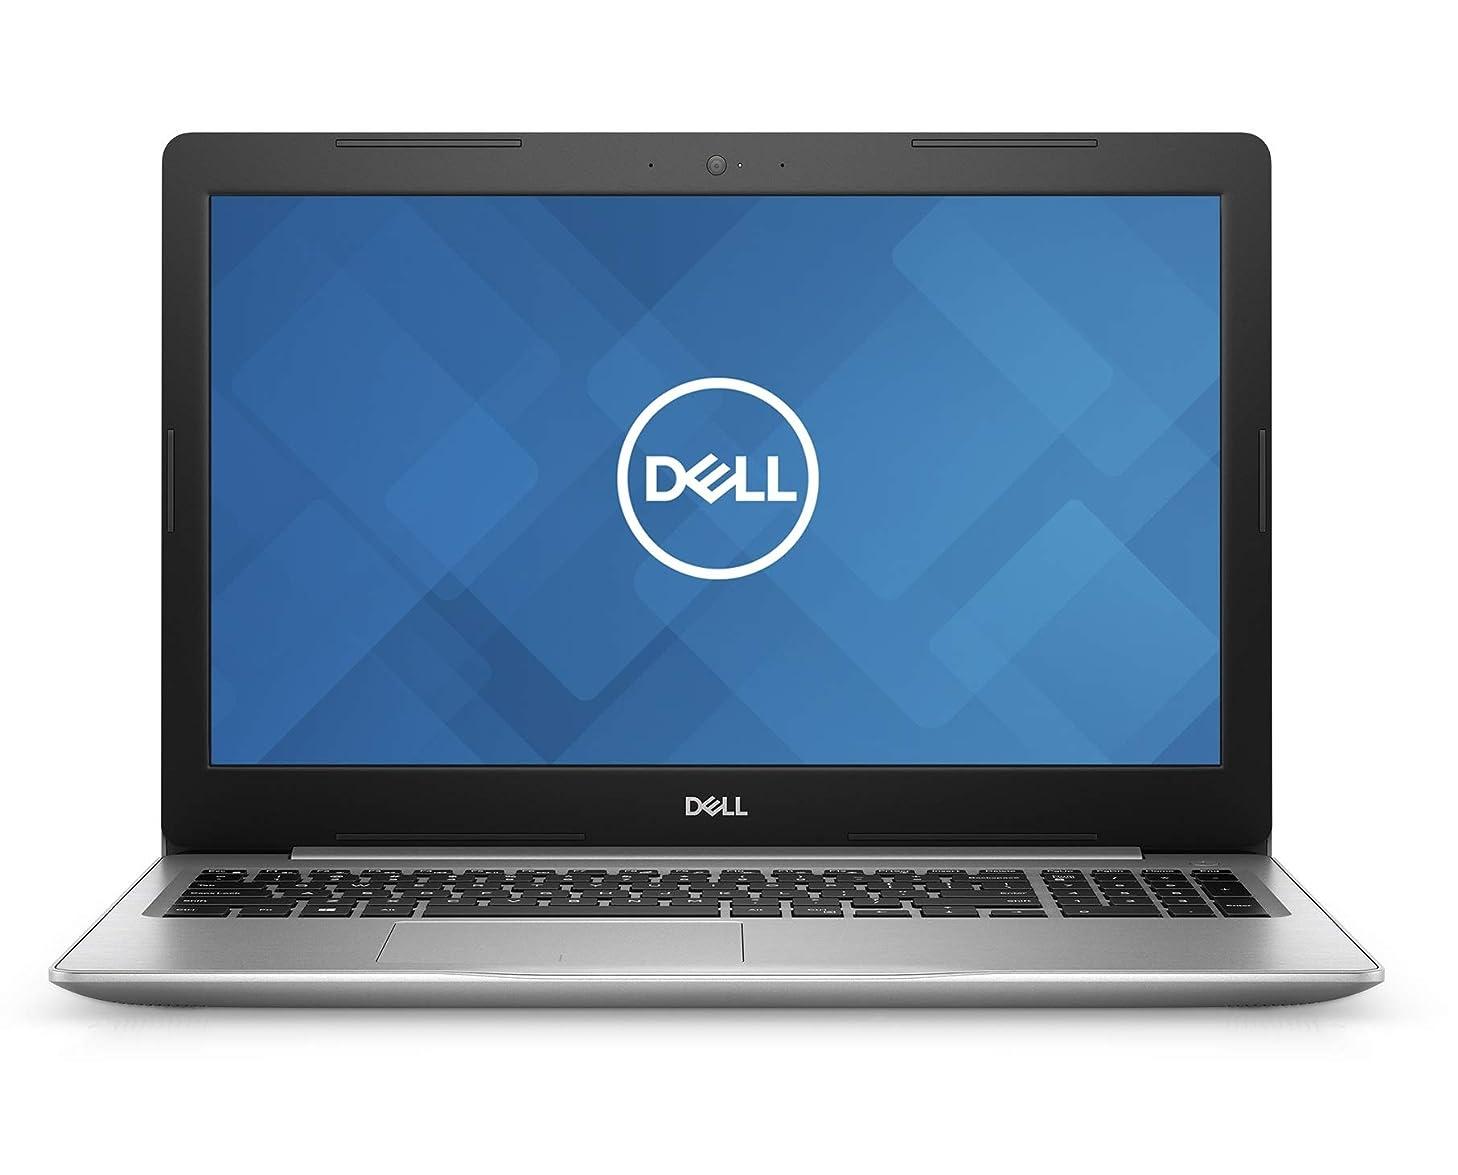 Dell Inspiron 15-5570 Home and Business Laptop (Intel i7-7500U 2-Core, 32GB RAM, 256GB SATA SSD + 1TB HDD, 15.6